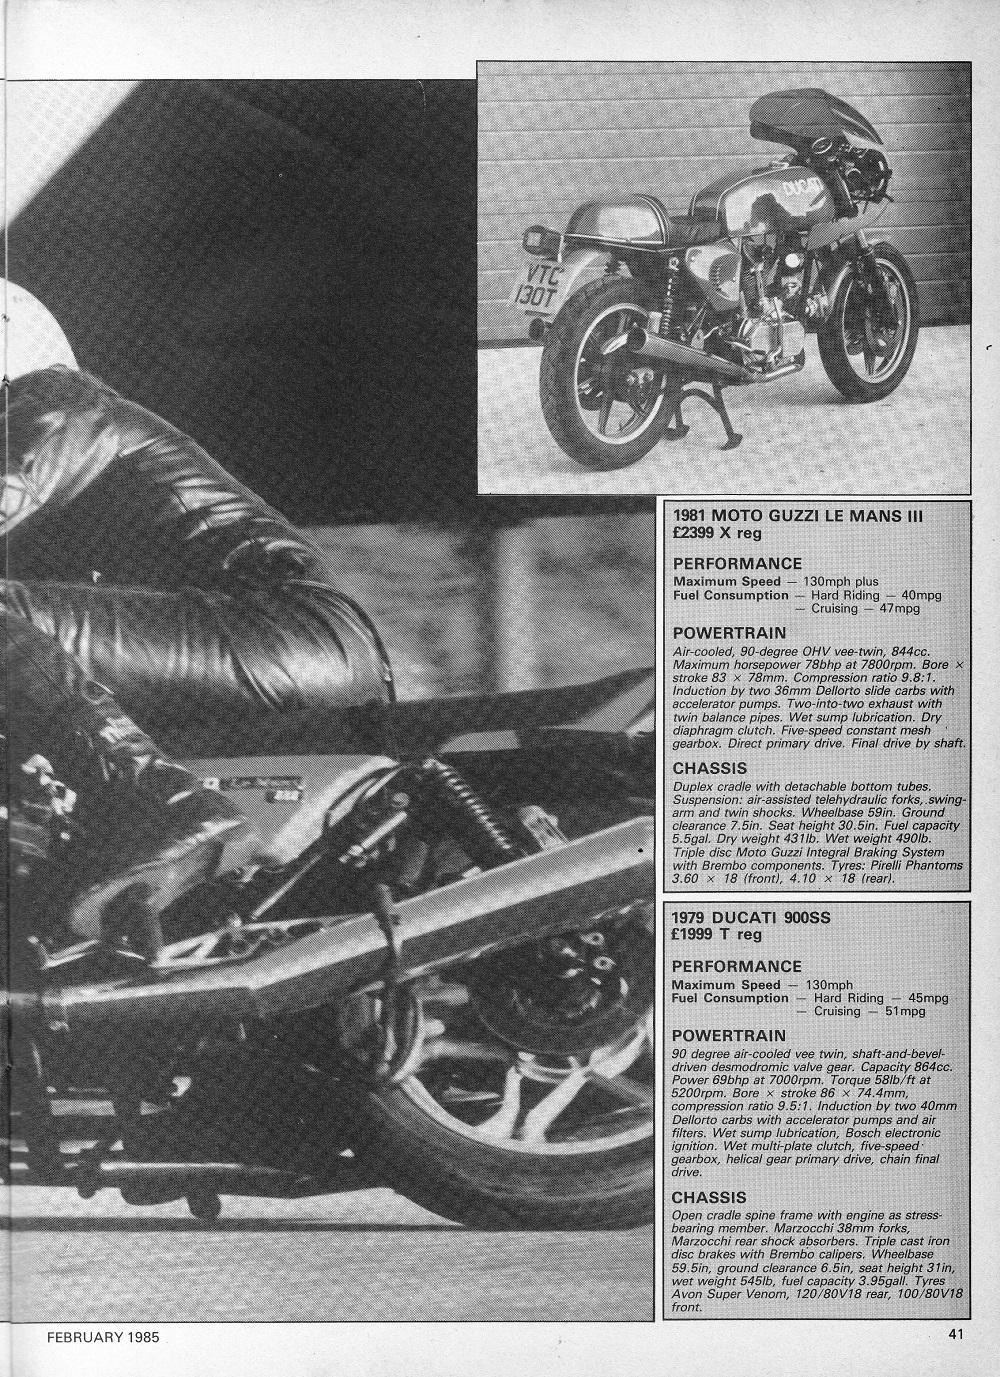 1979 Ducati 900SS & 1981 Moto Guzzi Le Mans 111 road test7.jpg